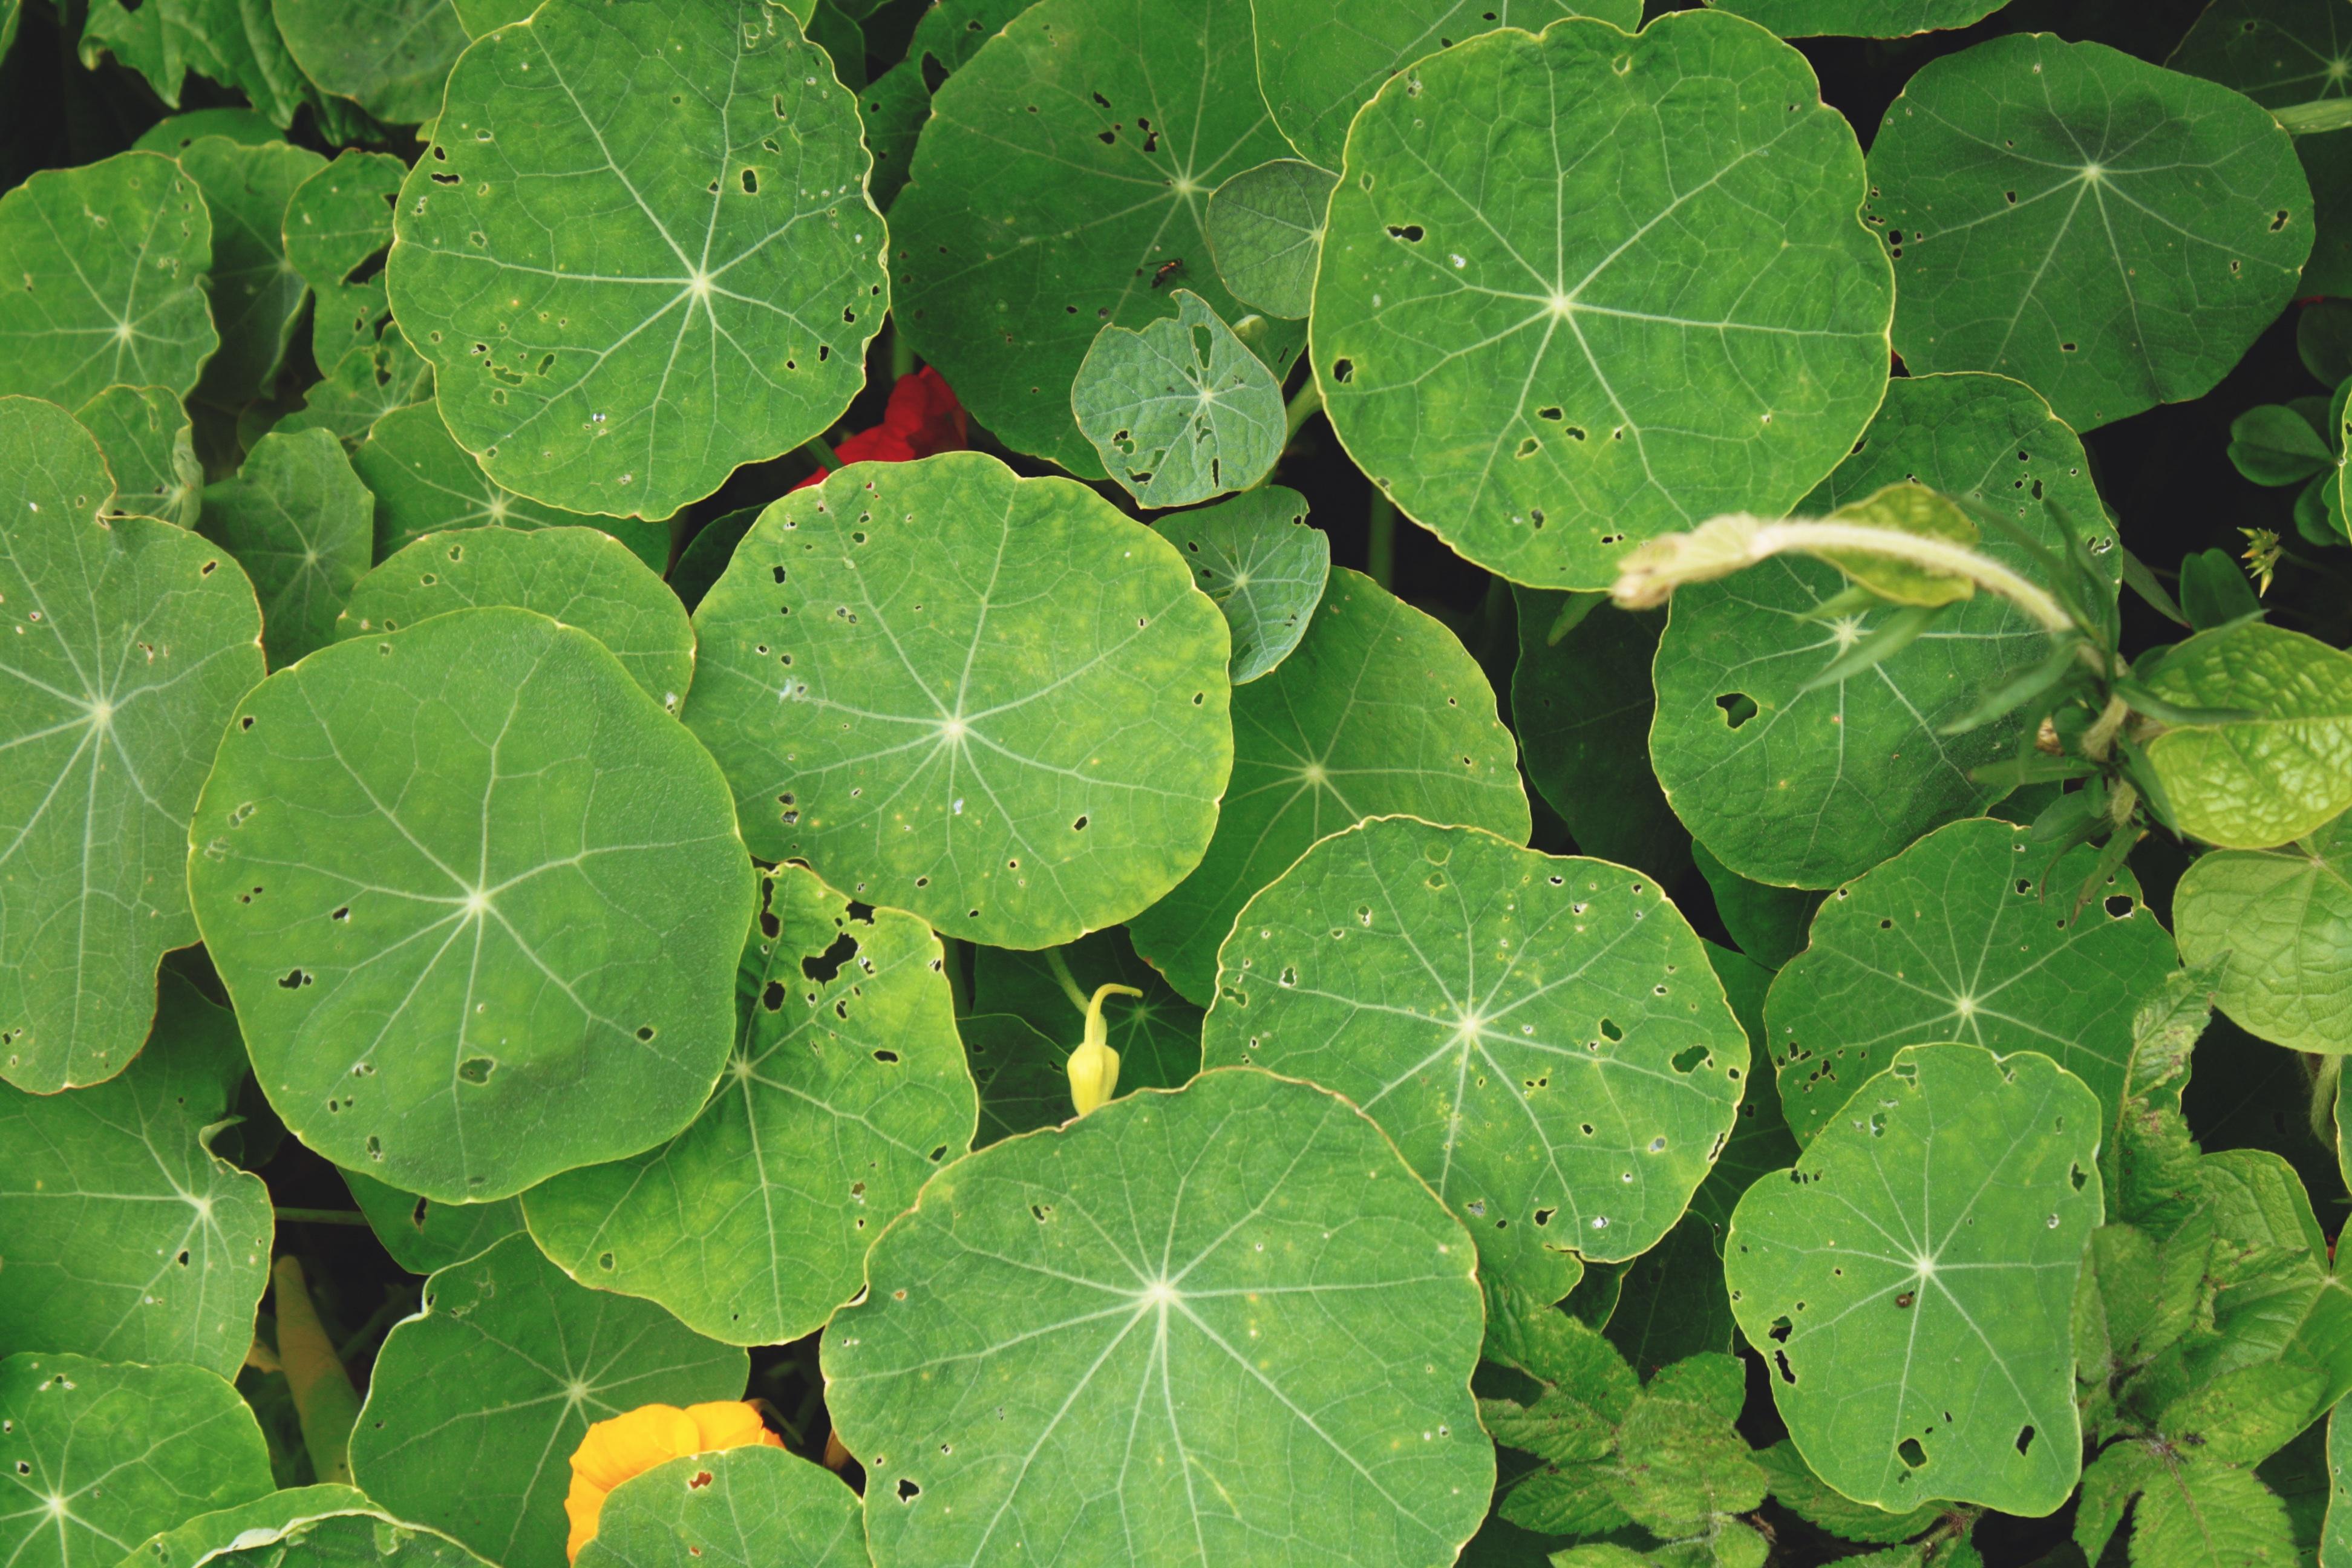 Fotos gratis : hoja, verde, hierba, Produce, botánica ...